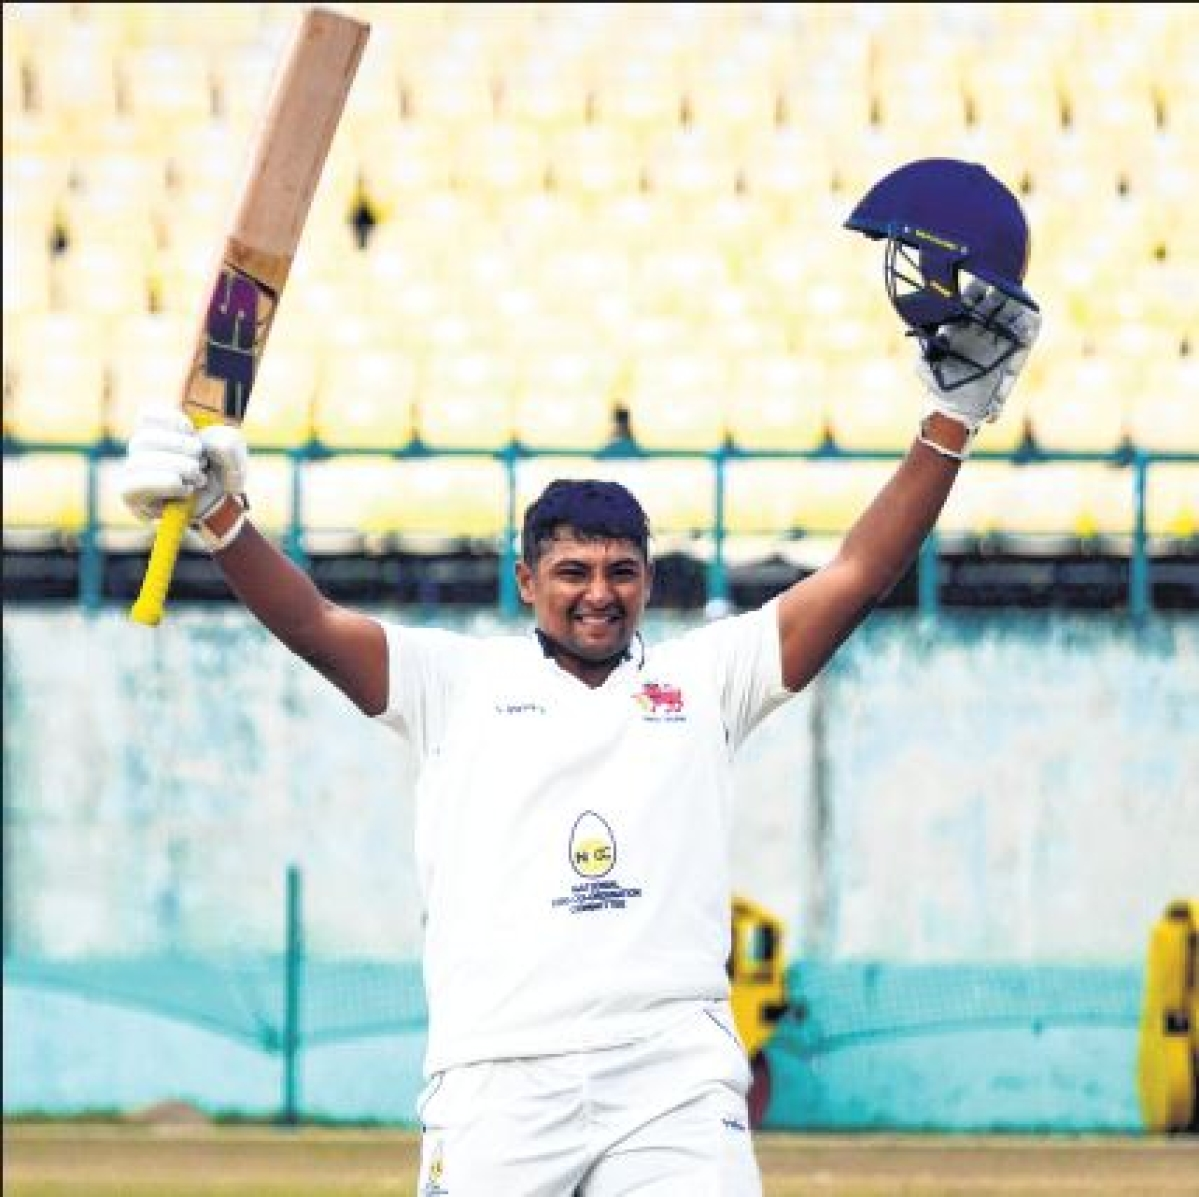 Himachal Pradesh vs Mumbai: Sarfaraz slams another double-ton